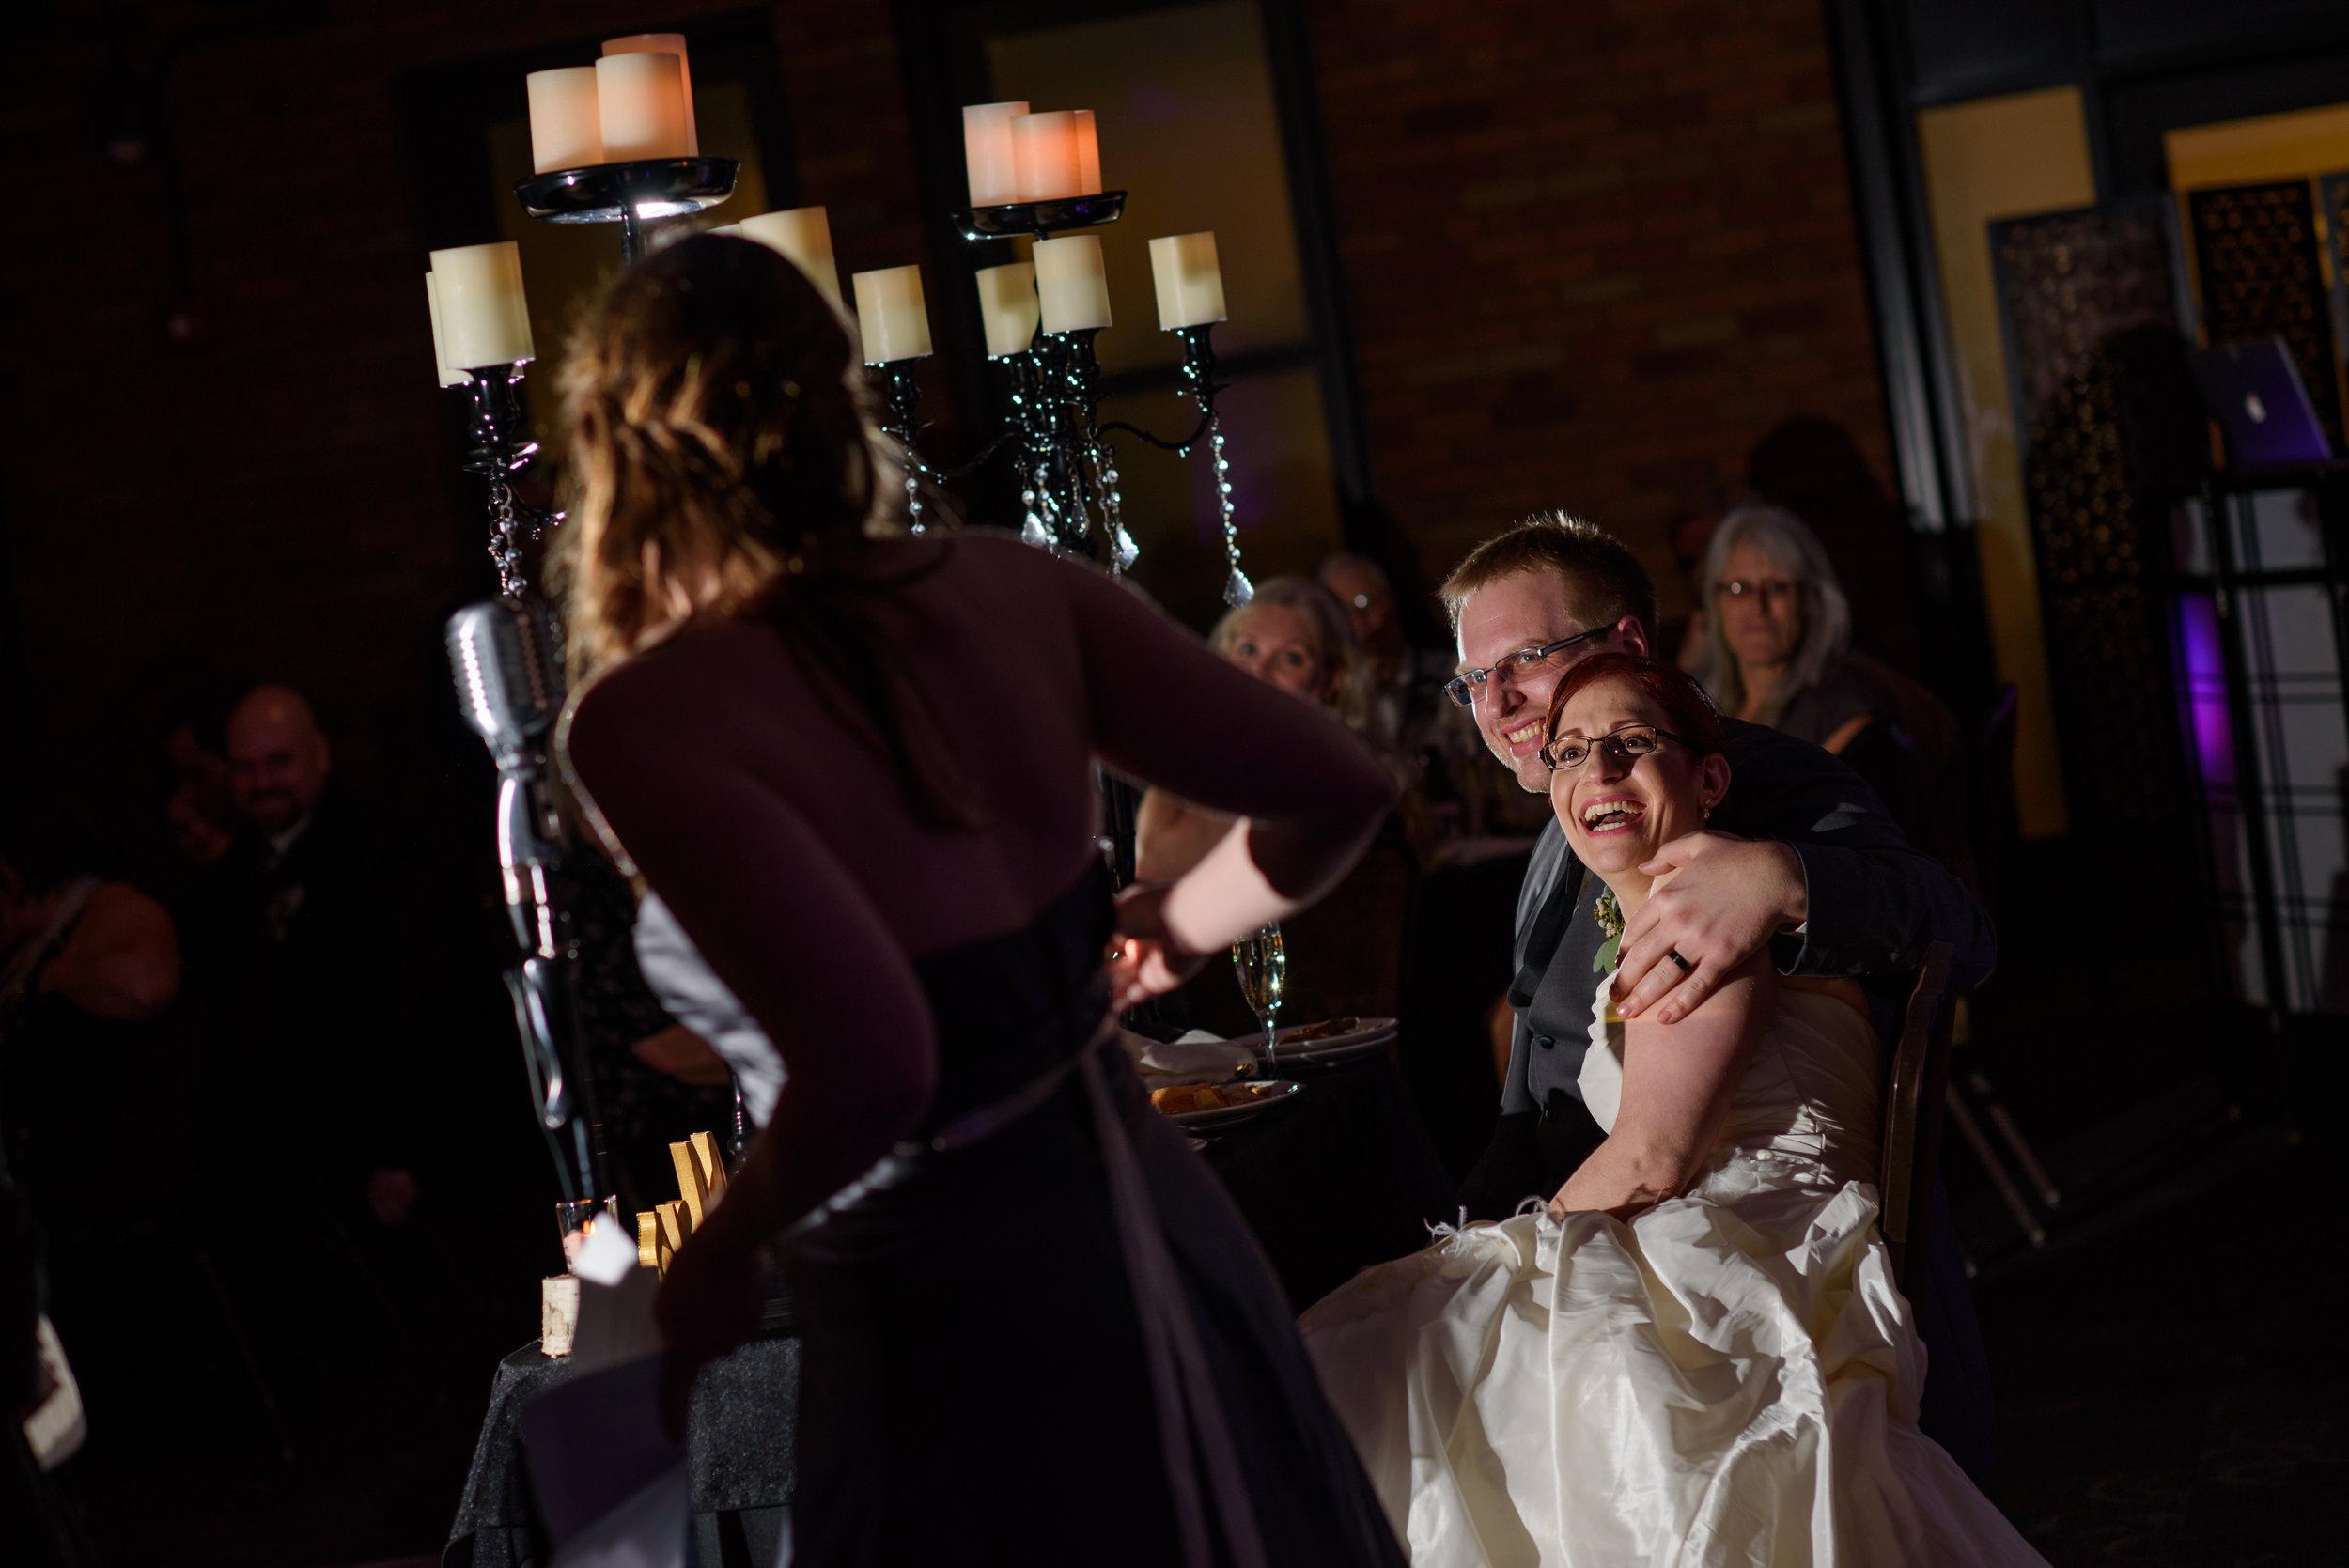 judith-john-005-citizen-hotel-sacramento-wedding-photographer-katherine-nicole-photography.JPG